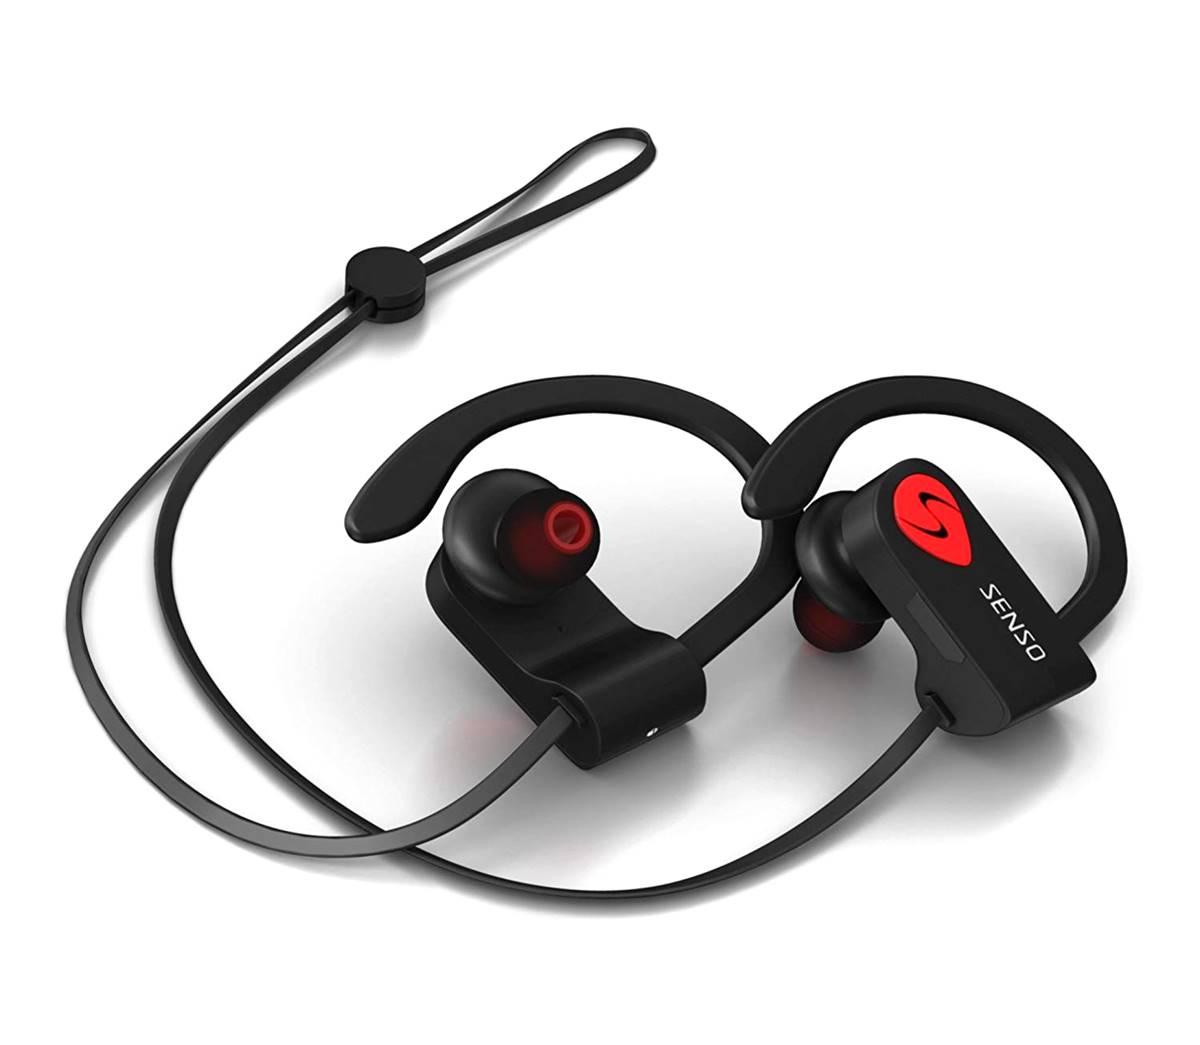 SENSO Bluetooth Workout Earbuds